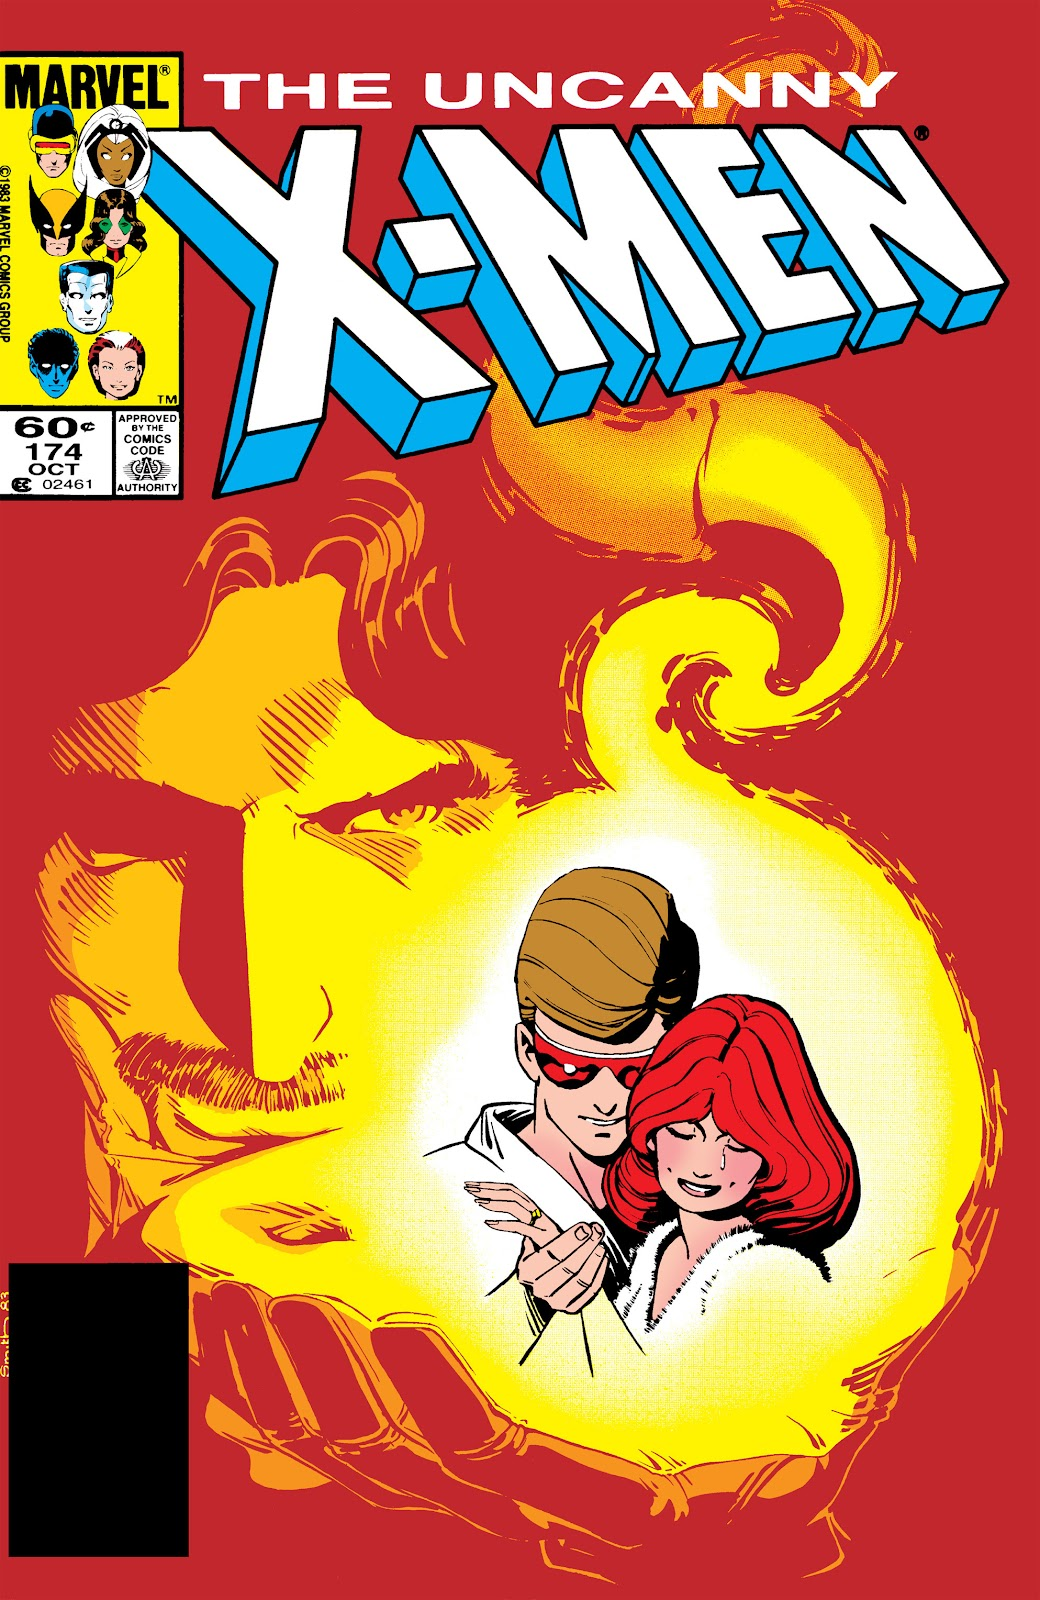 Uncanny X-Men (1963) issue 174 - Page 1